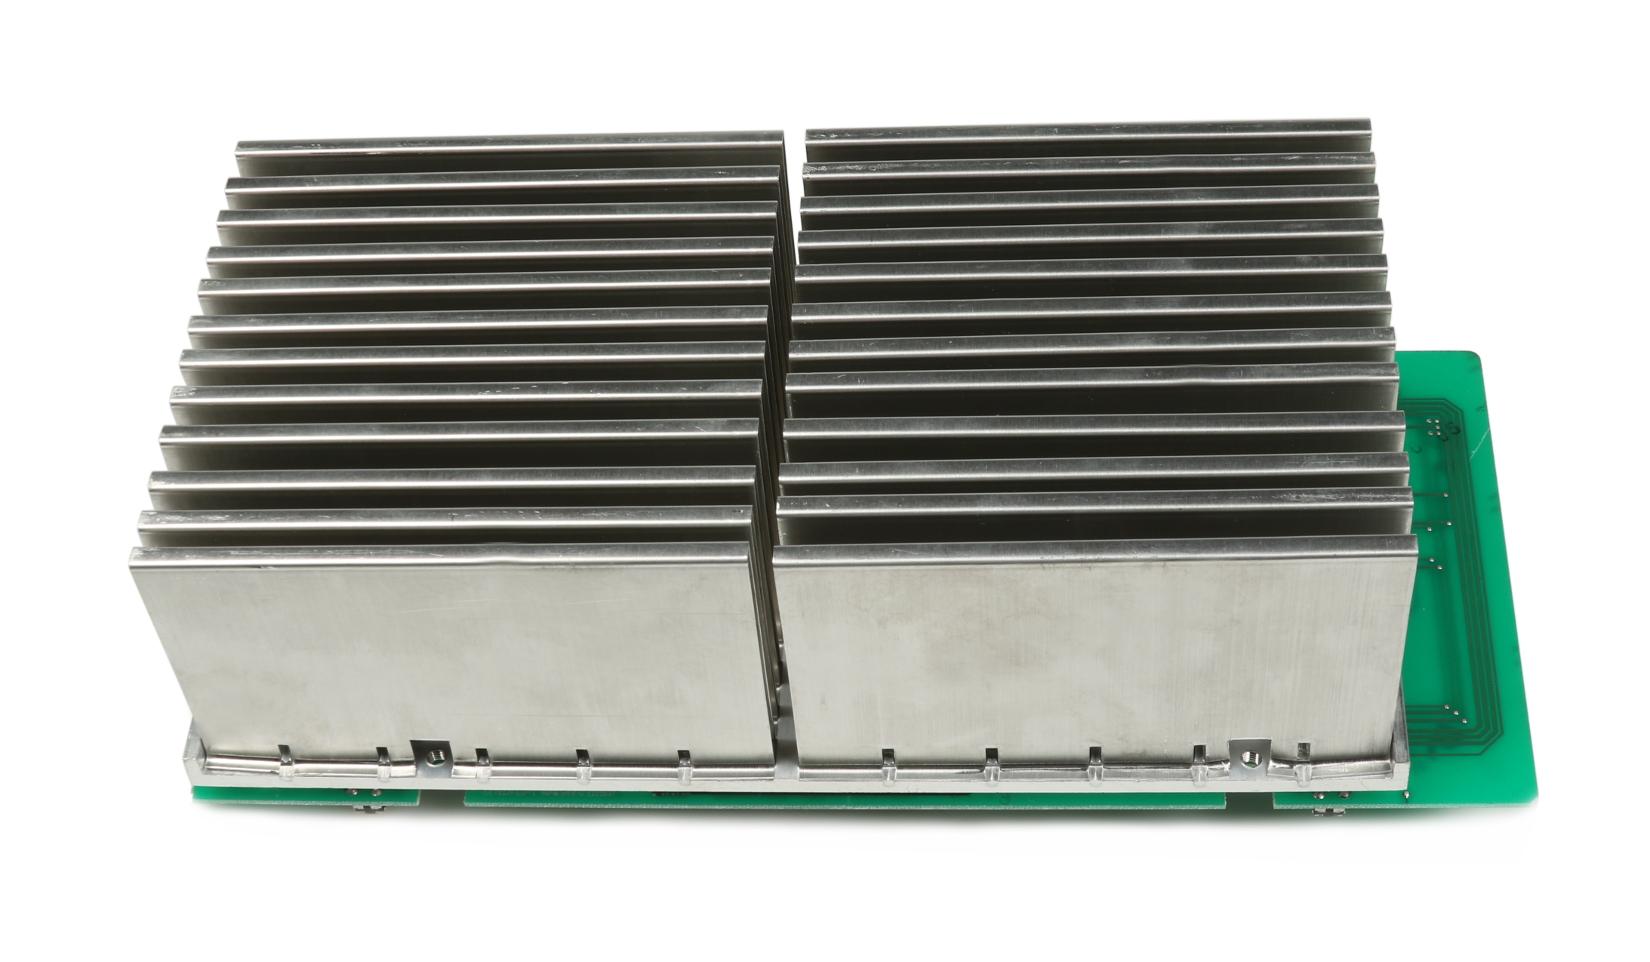 EMX312SC Amp PCB Assembly